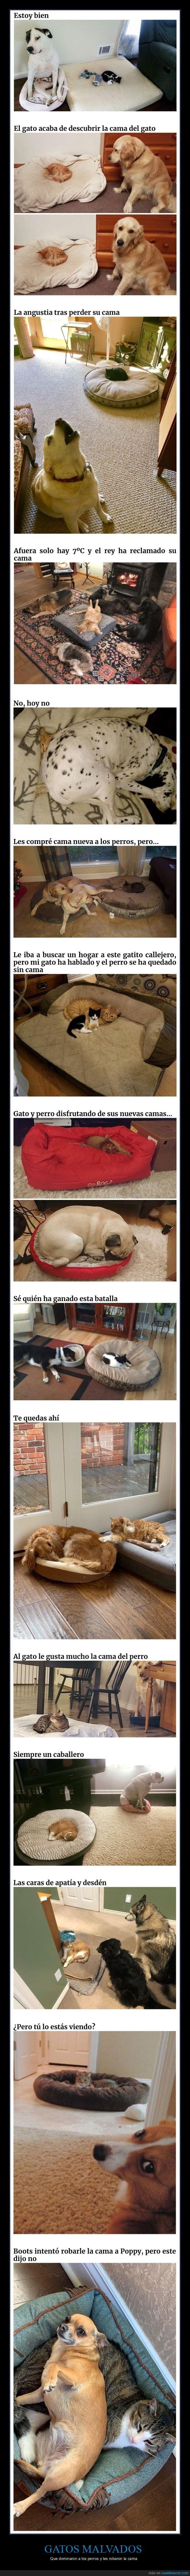 cama,gatos,perros,robar